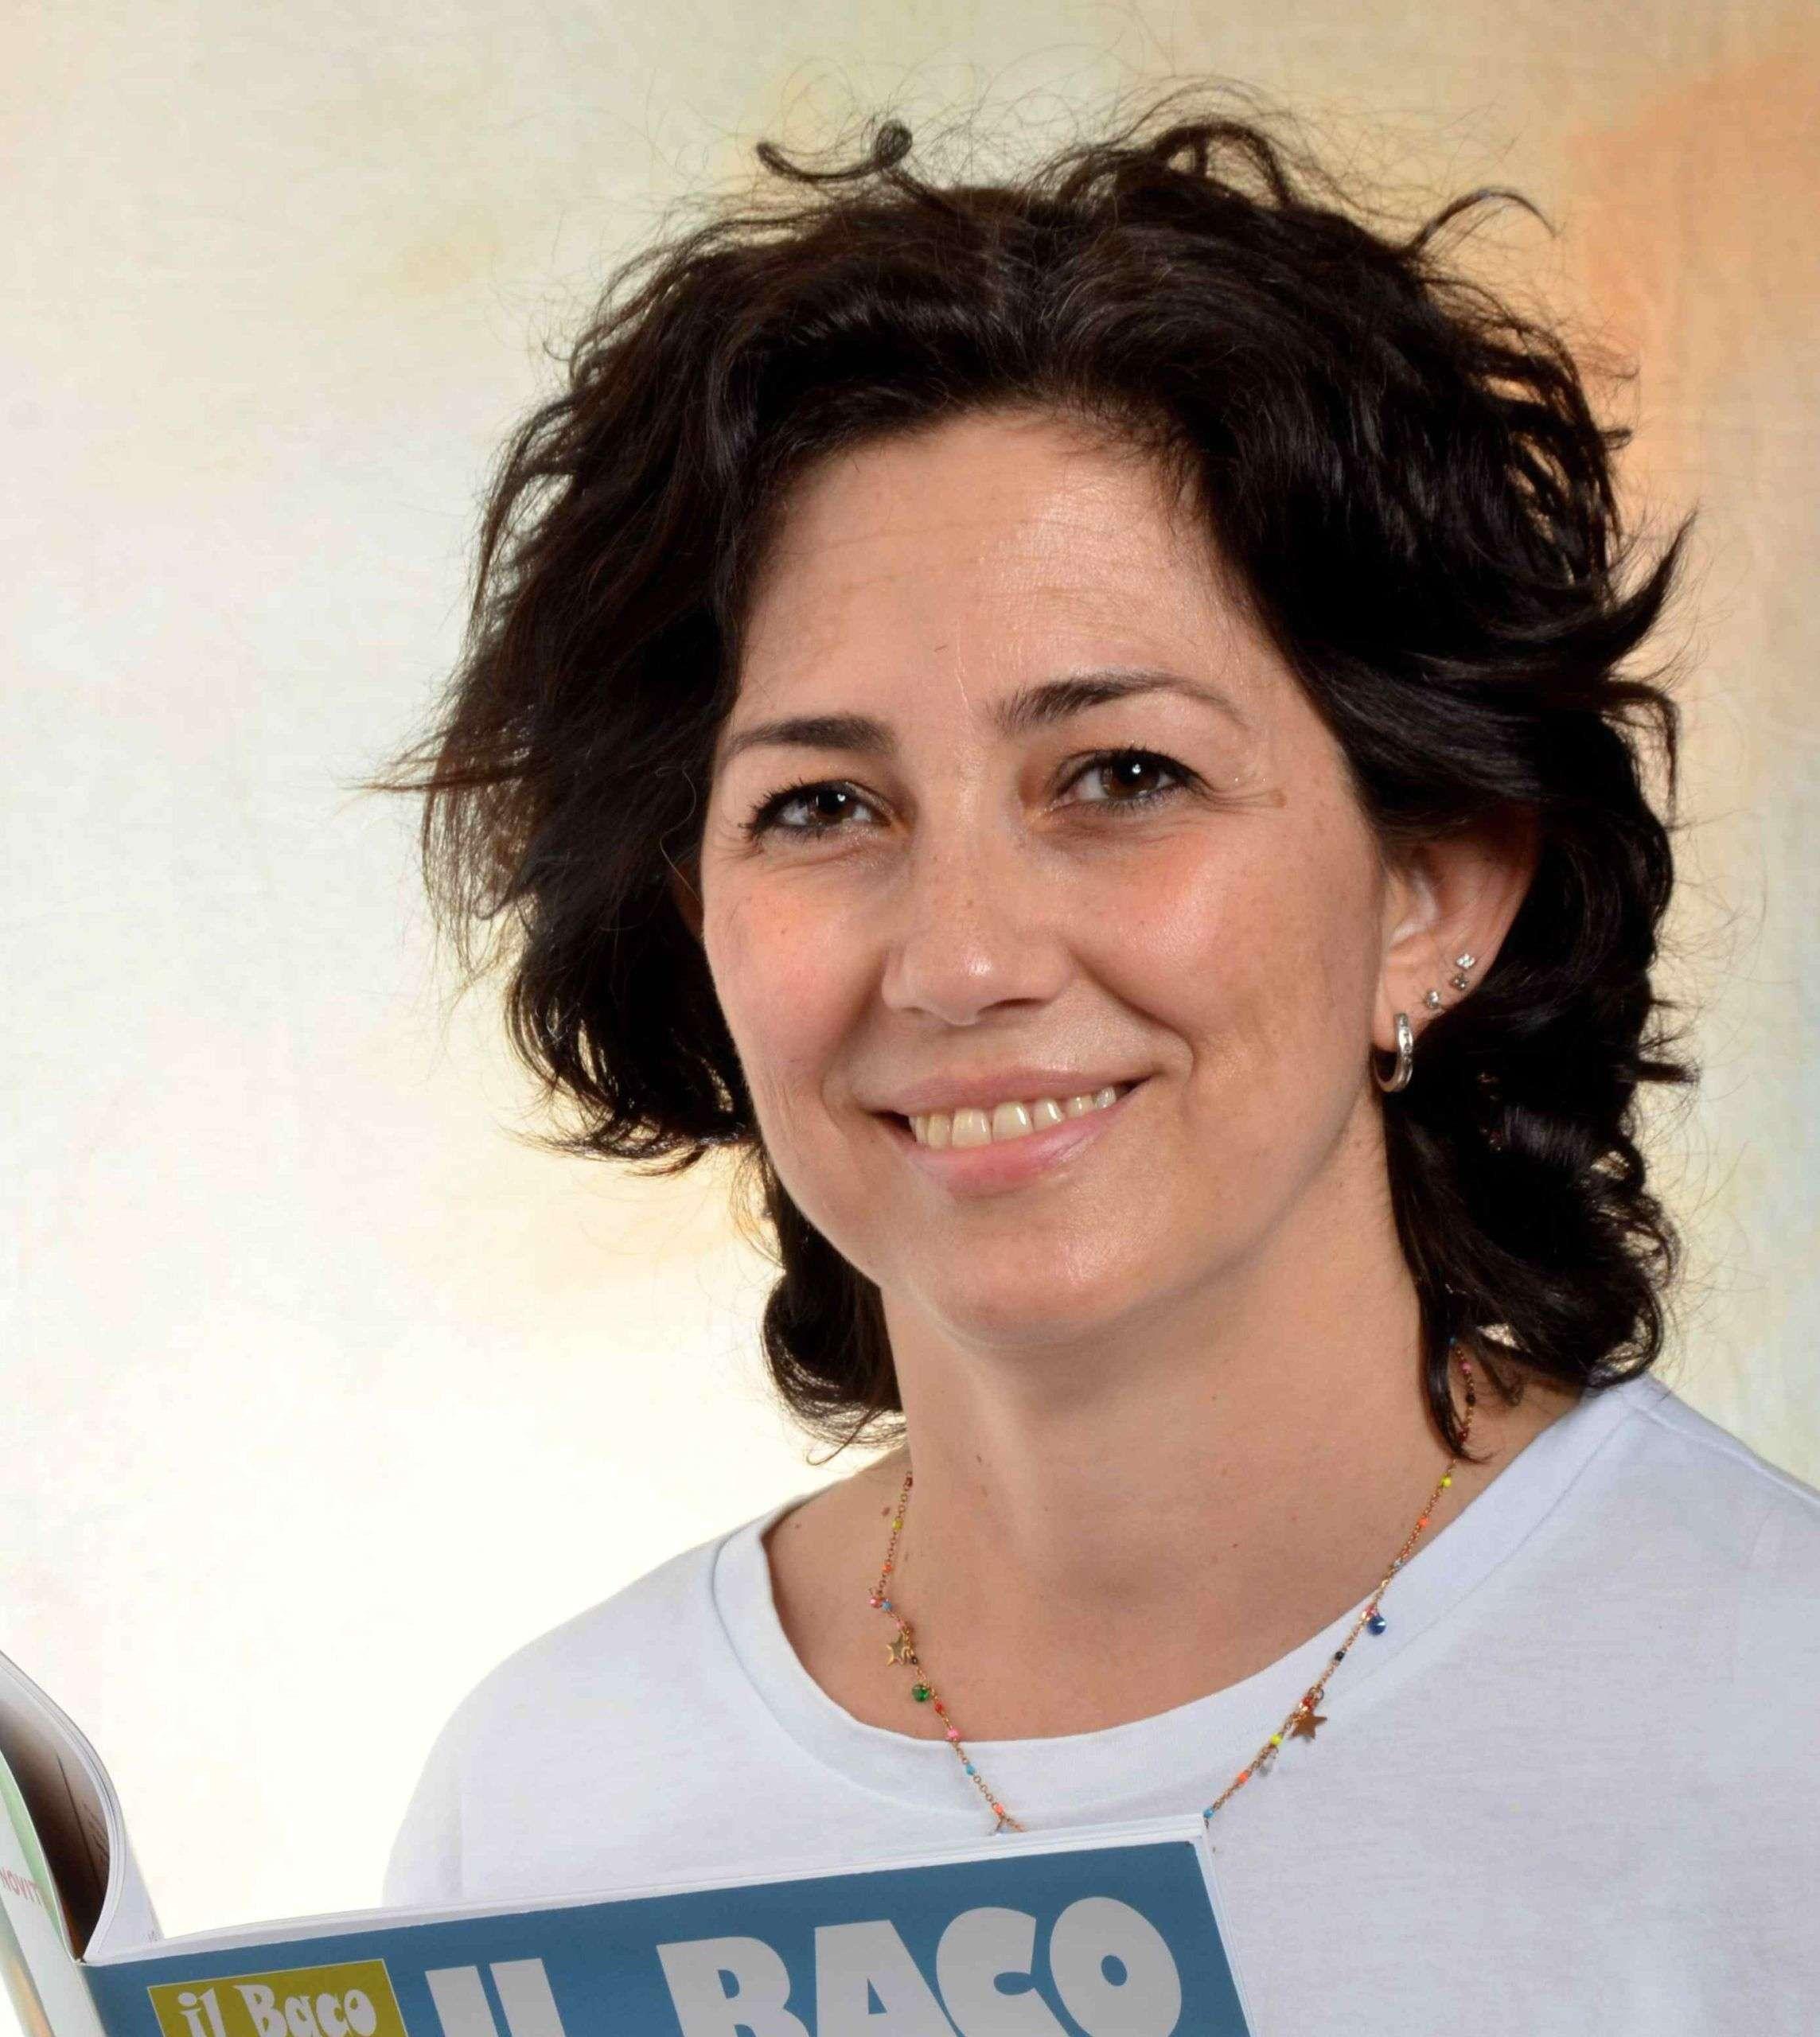 Francesca Tenerelli